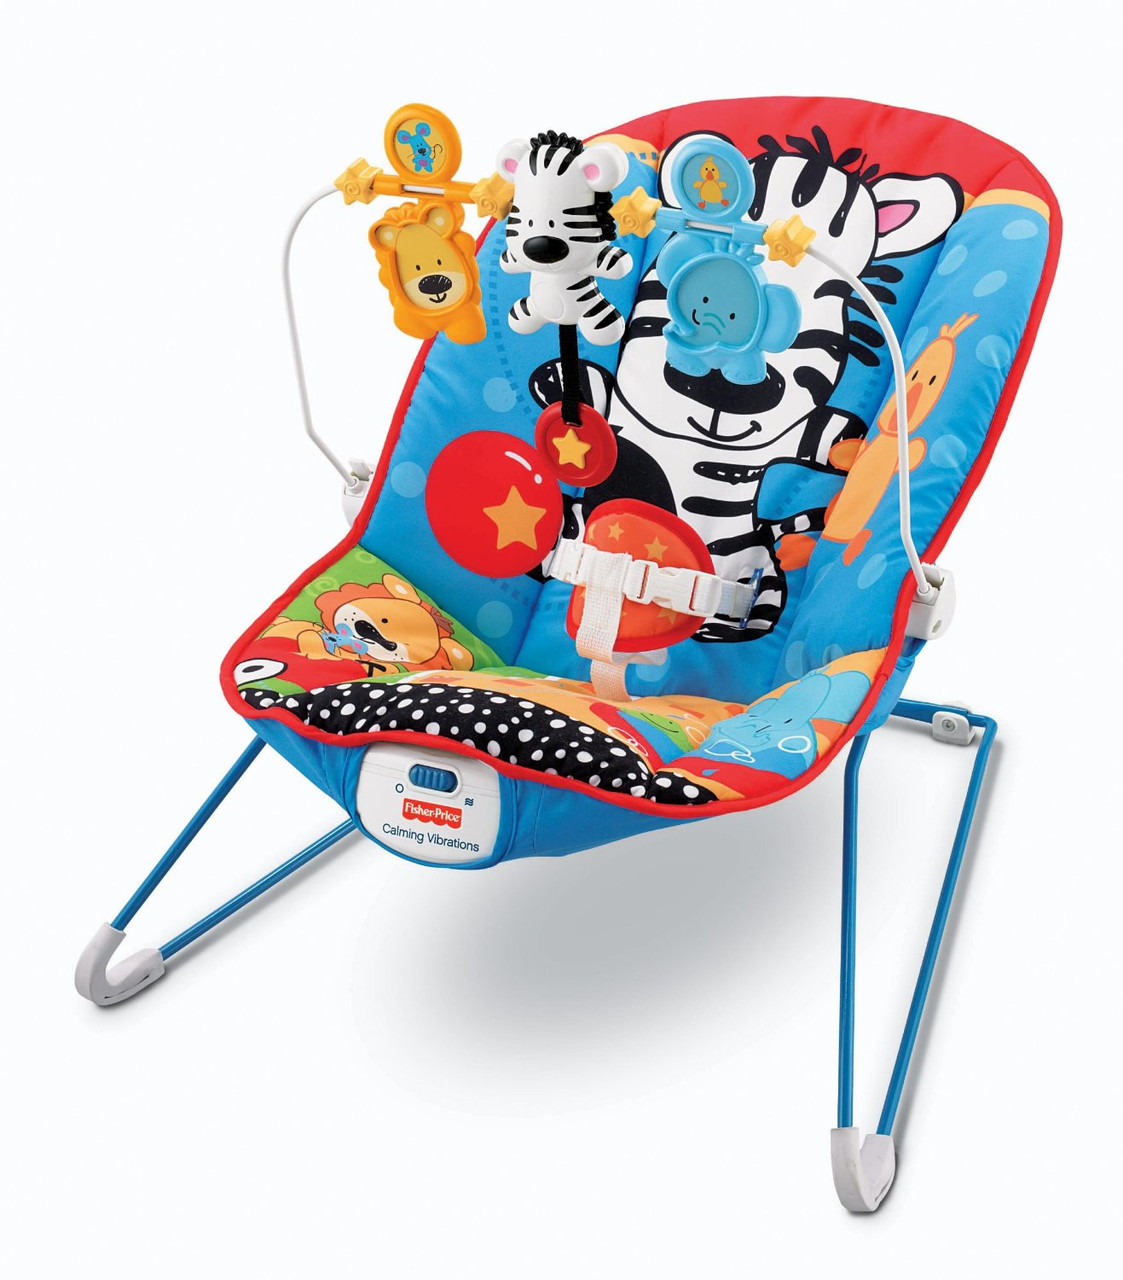 Кресло-качалка Веселые зверята Fisher Price   прокат в Харькове